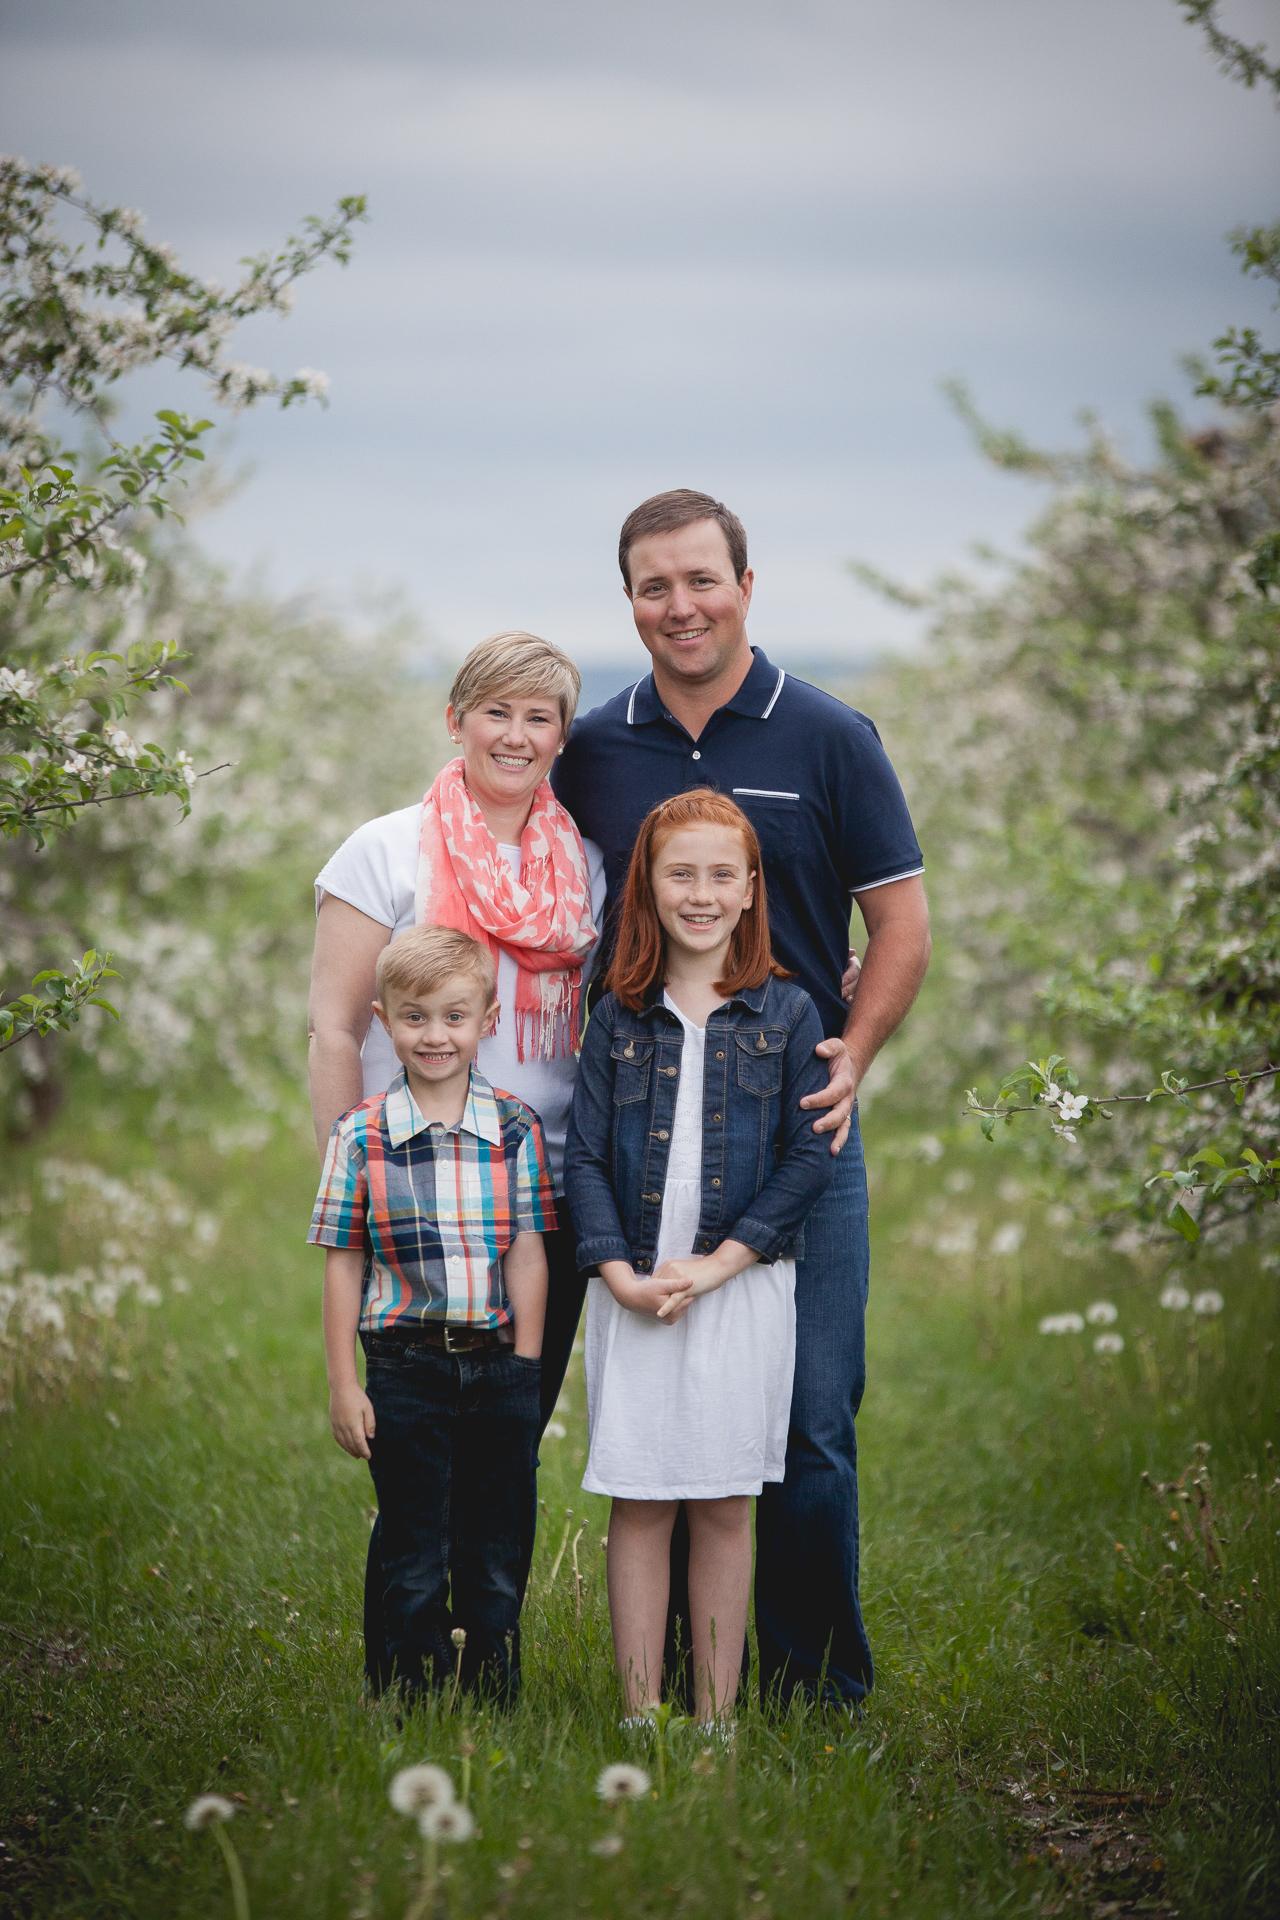 thornbury family photography